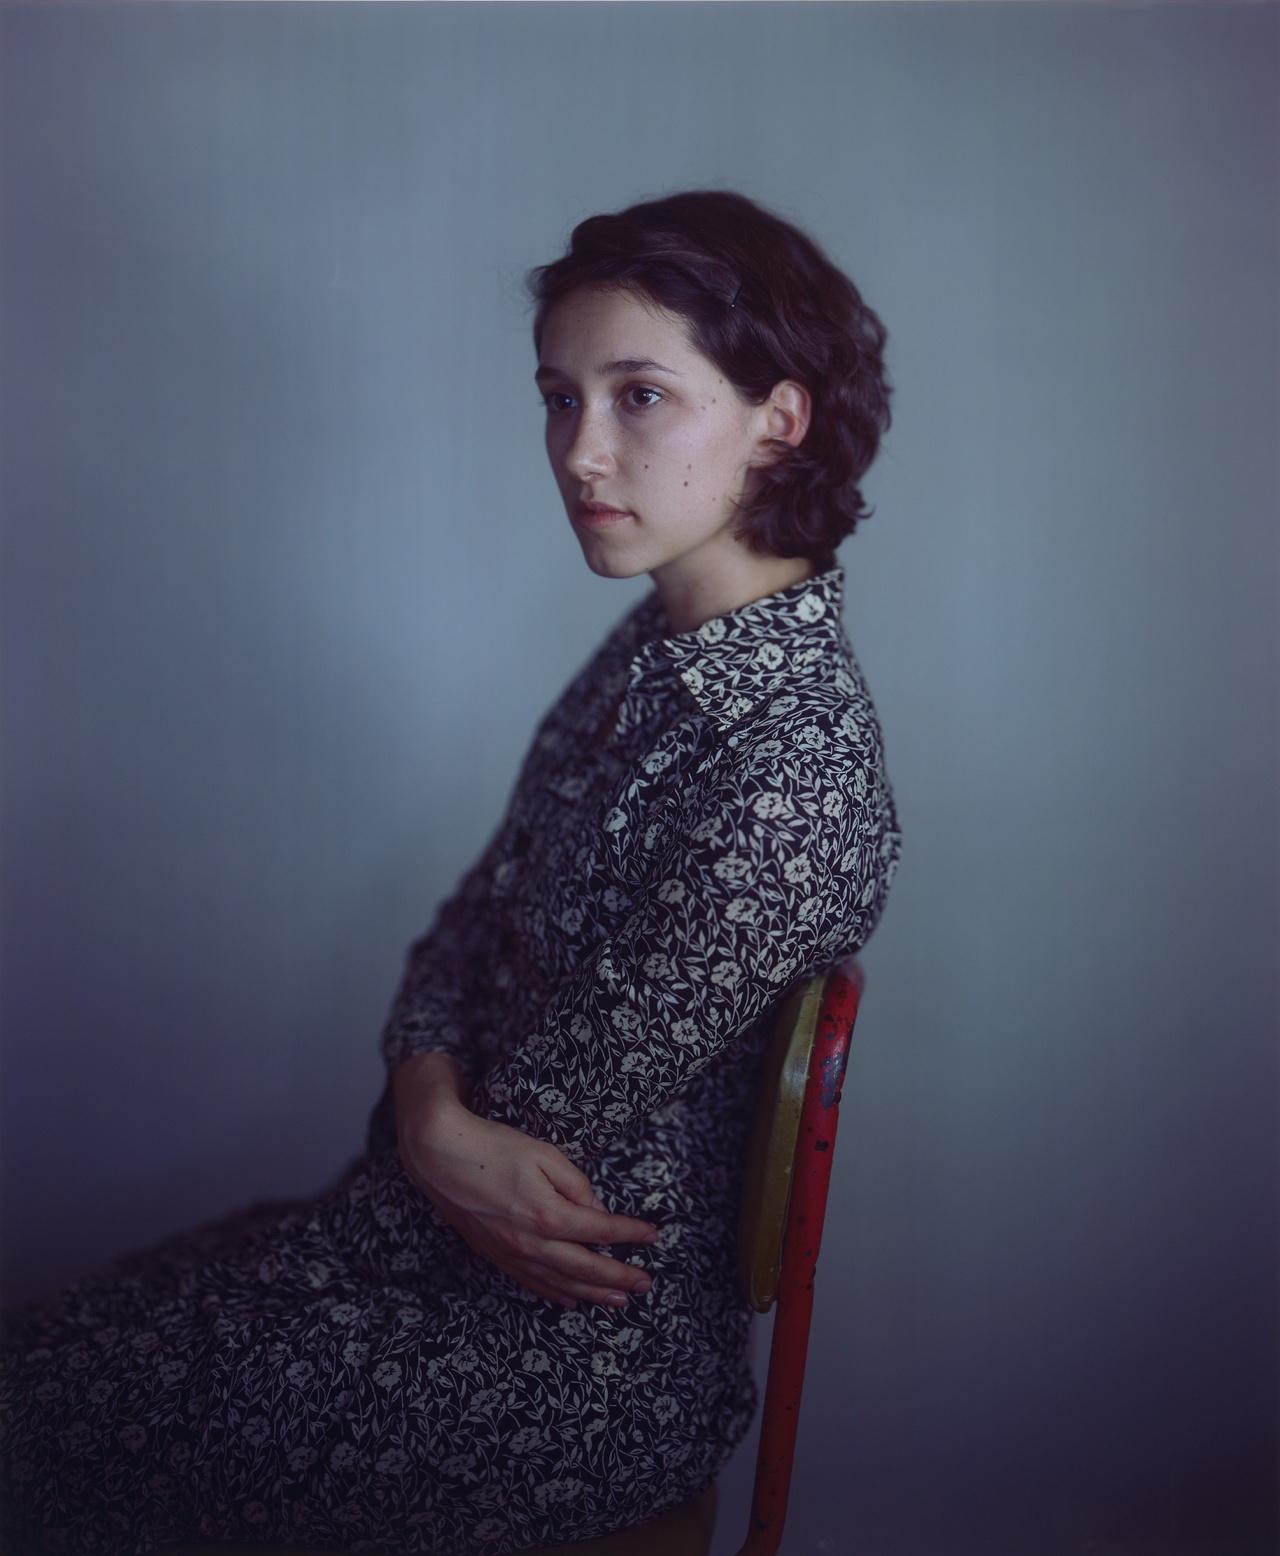 "Richard Learoyd, ""Nancy flowered dress"" (2011), camera obscura Ilfochrome photograph 58 x 48 in (image, sheet & mount), shown at Paris Photo (© Richard Learoyd, courtesy Fraenkel Gallery, San Francisco)"